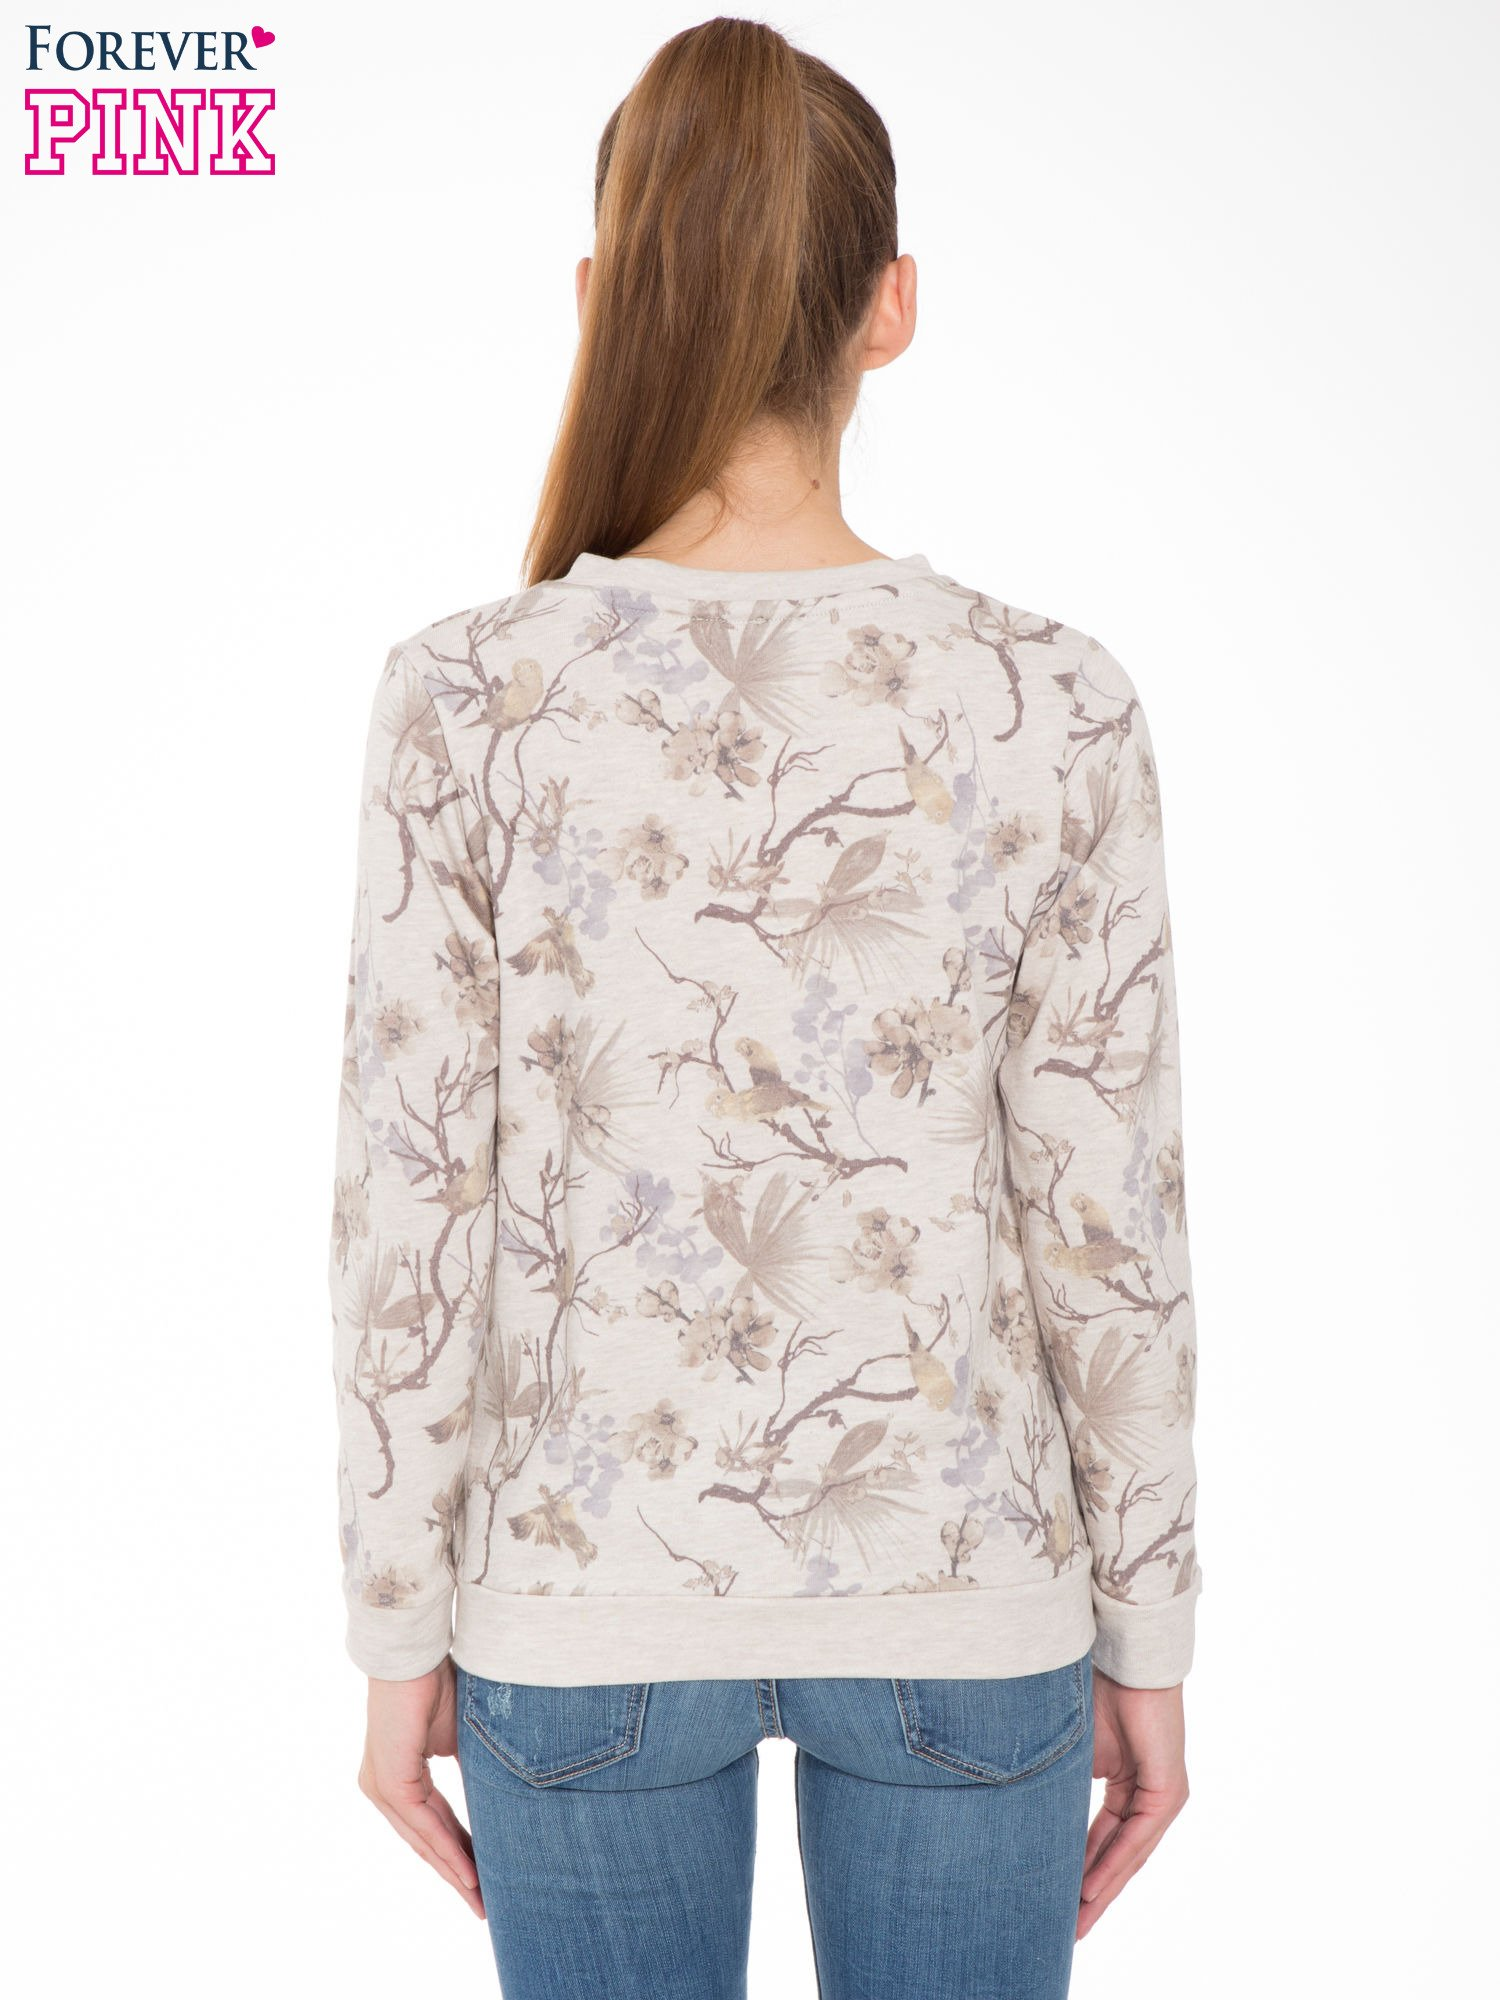 Beżowa bluza z nadrukiem all over floral print                                  zdj.                                  4